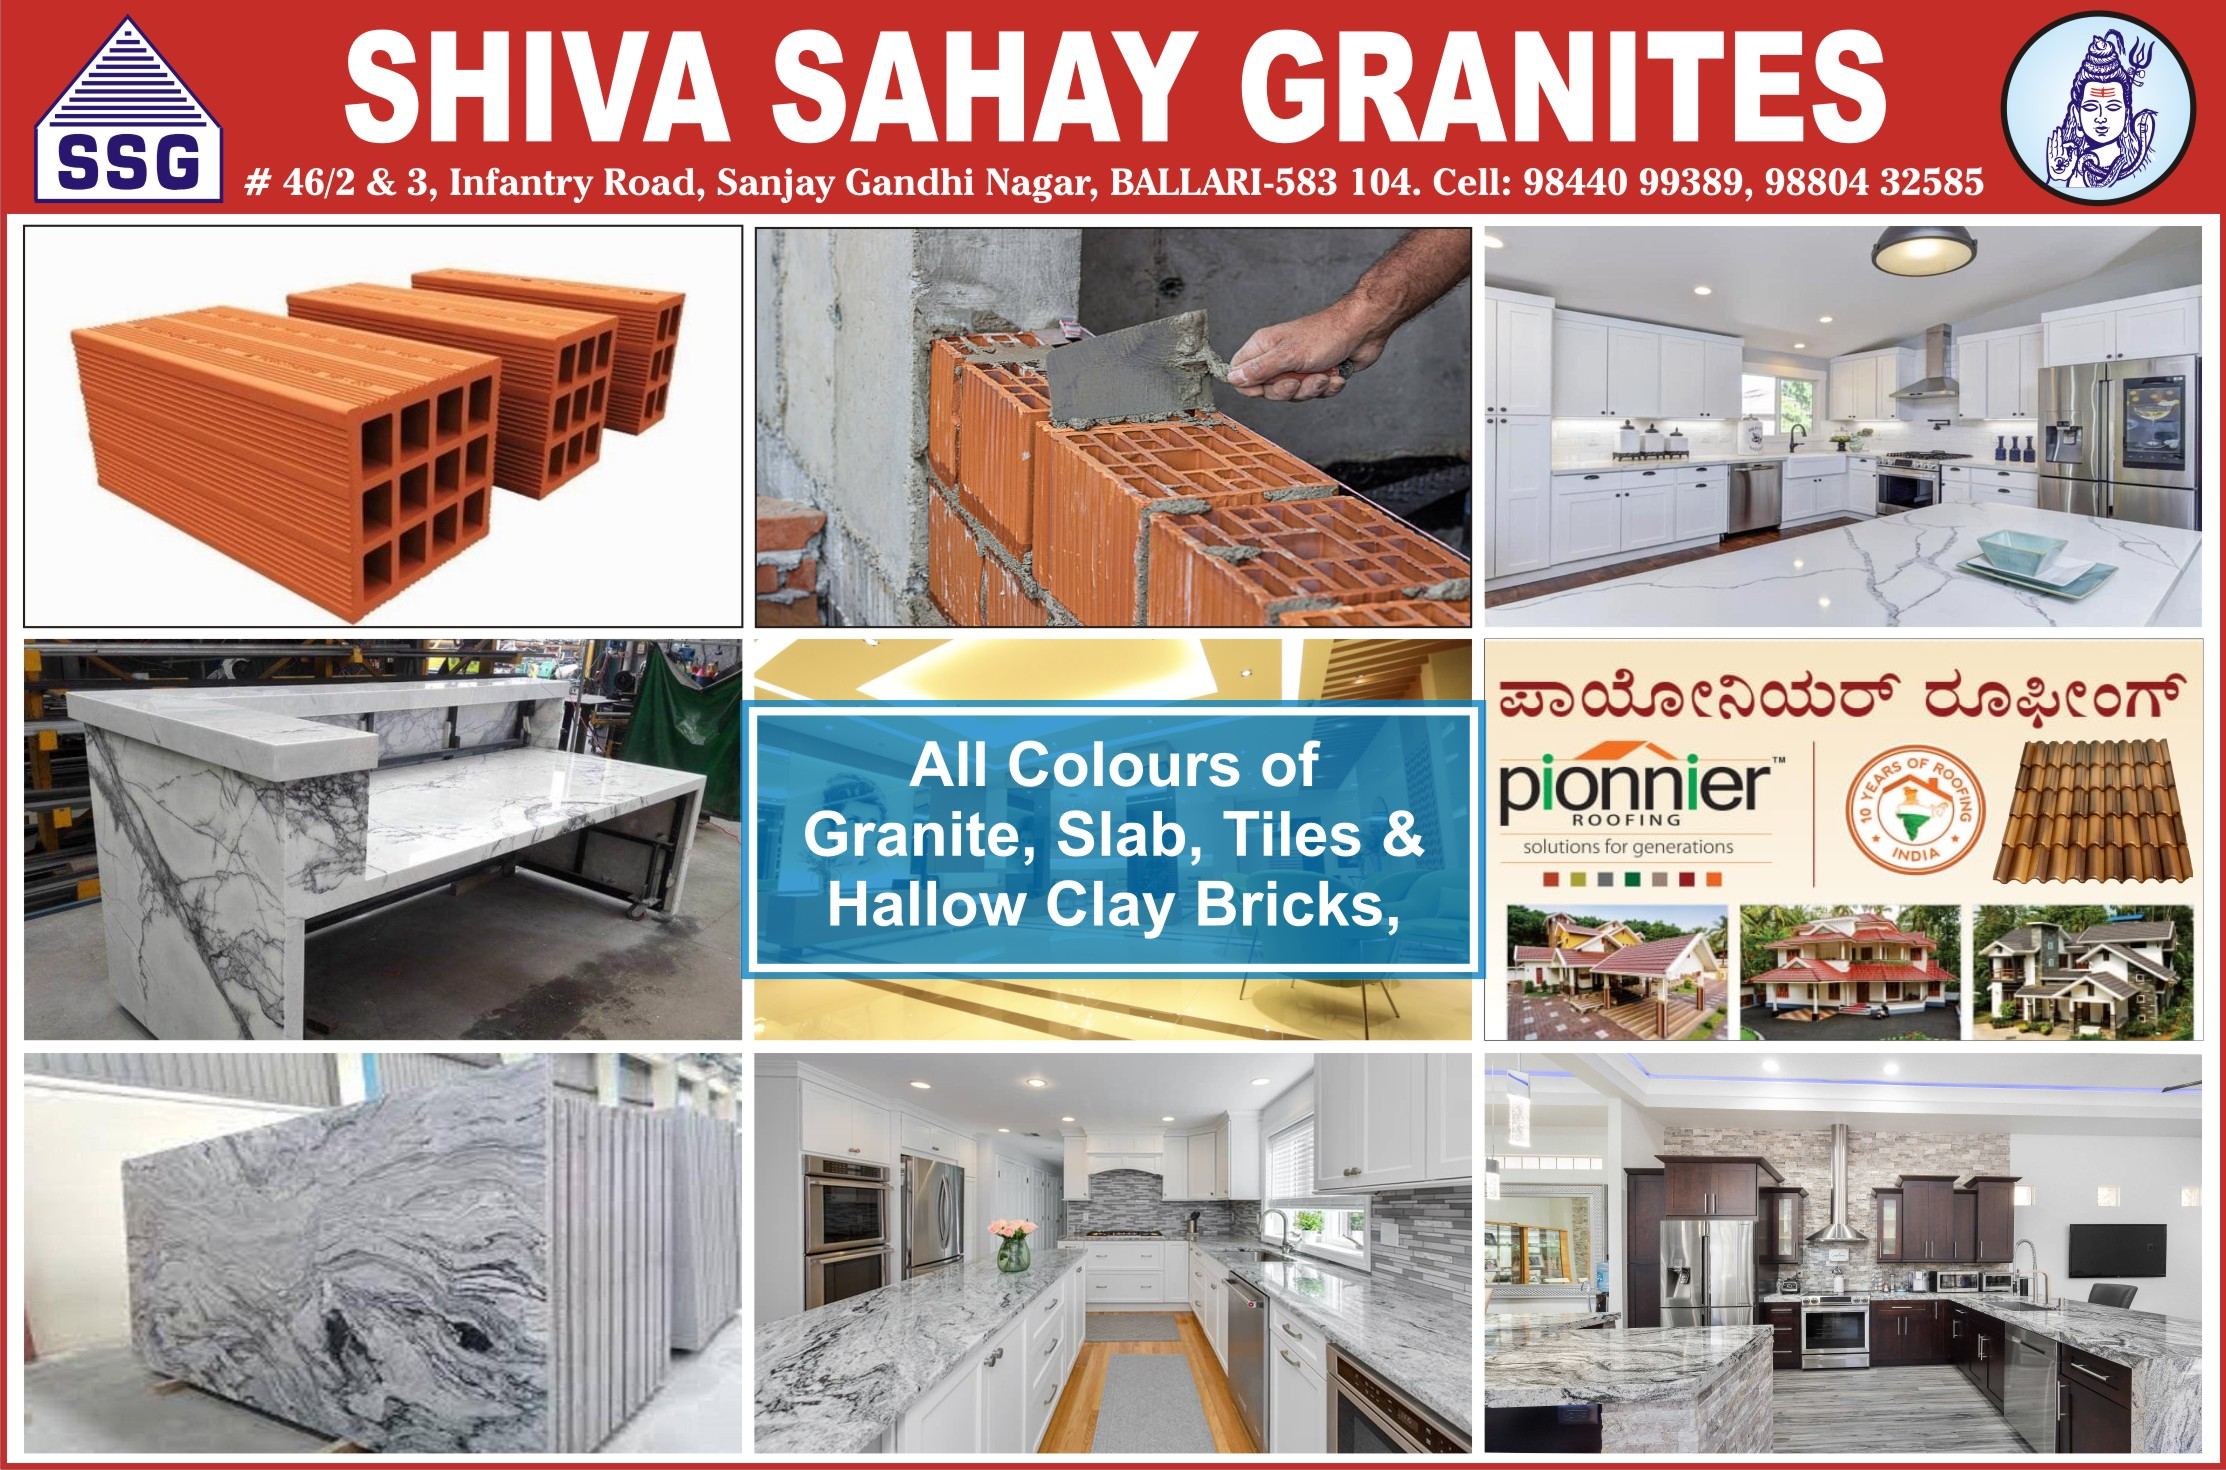 Shiva Sahay Granites